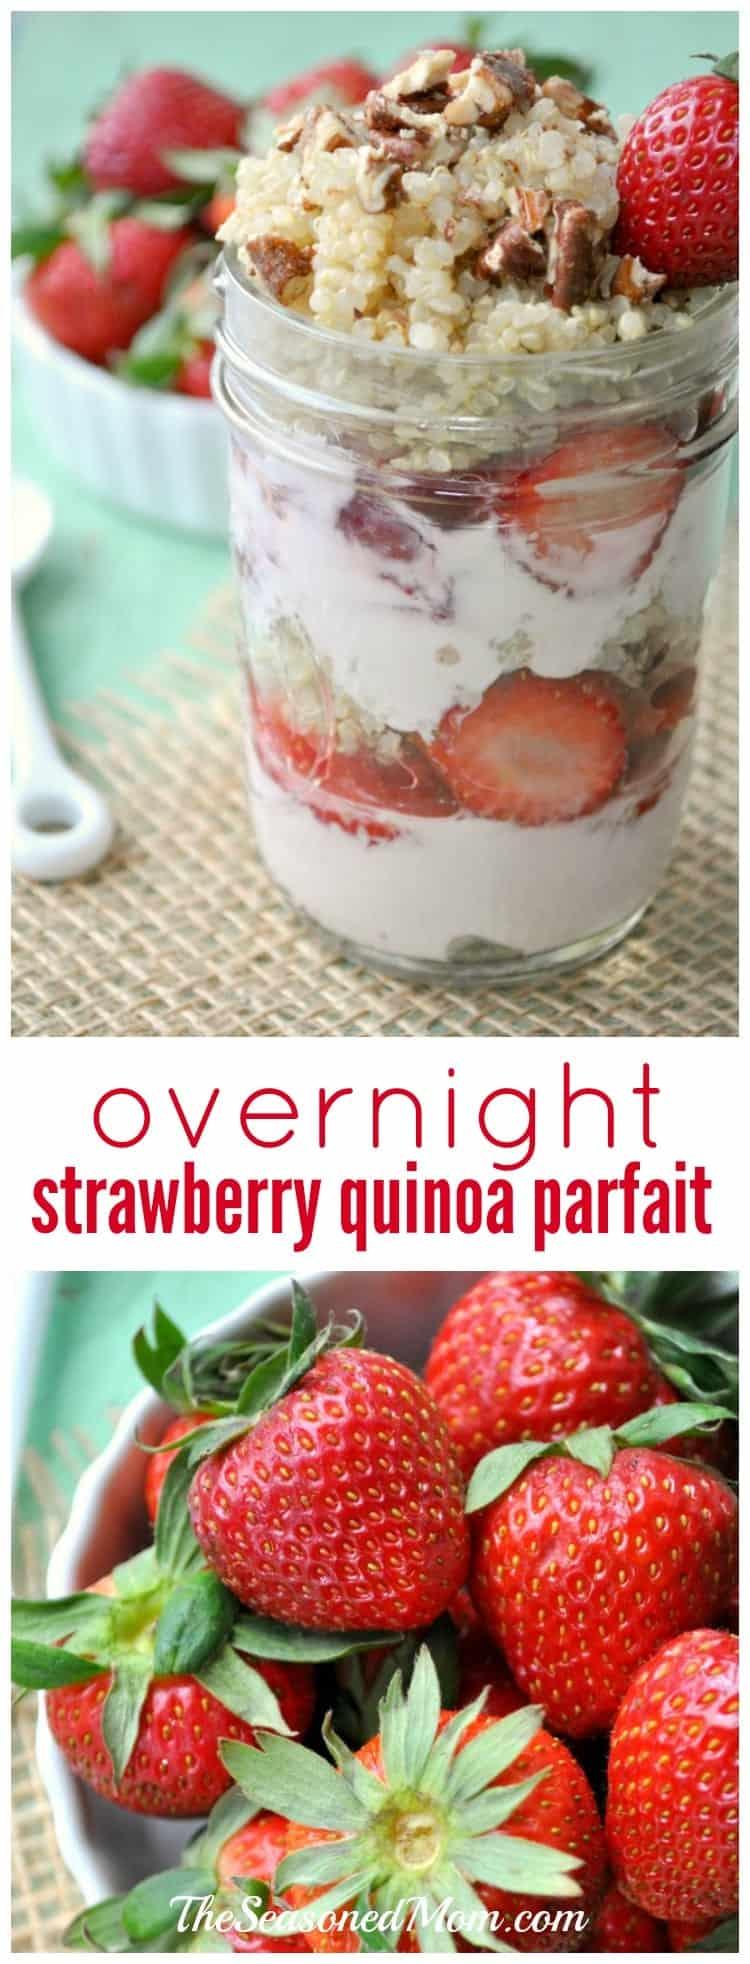 Overnight Strawberry Quinoa Parfait